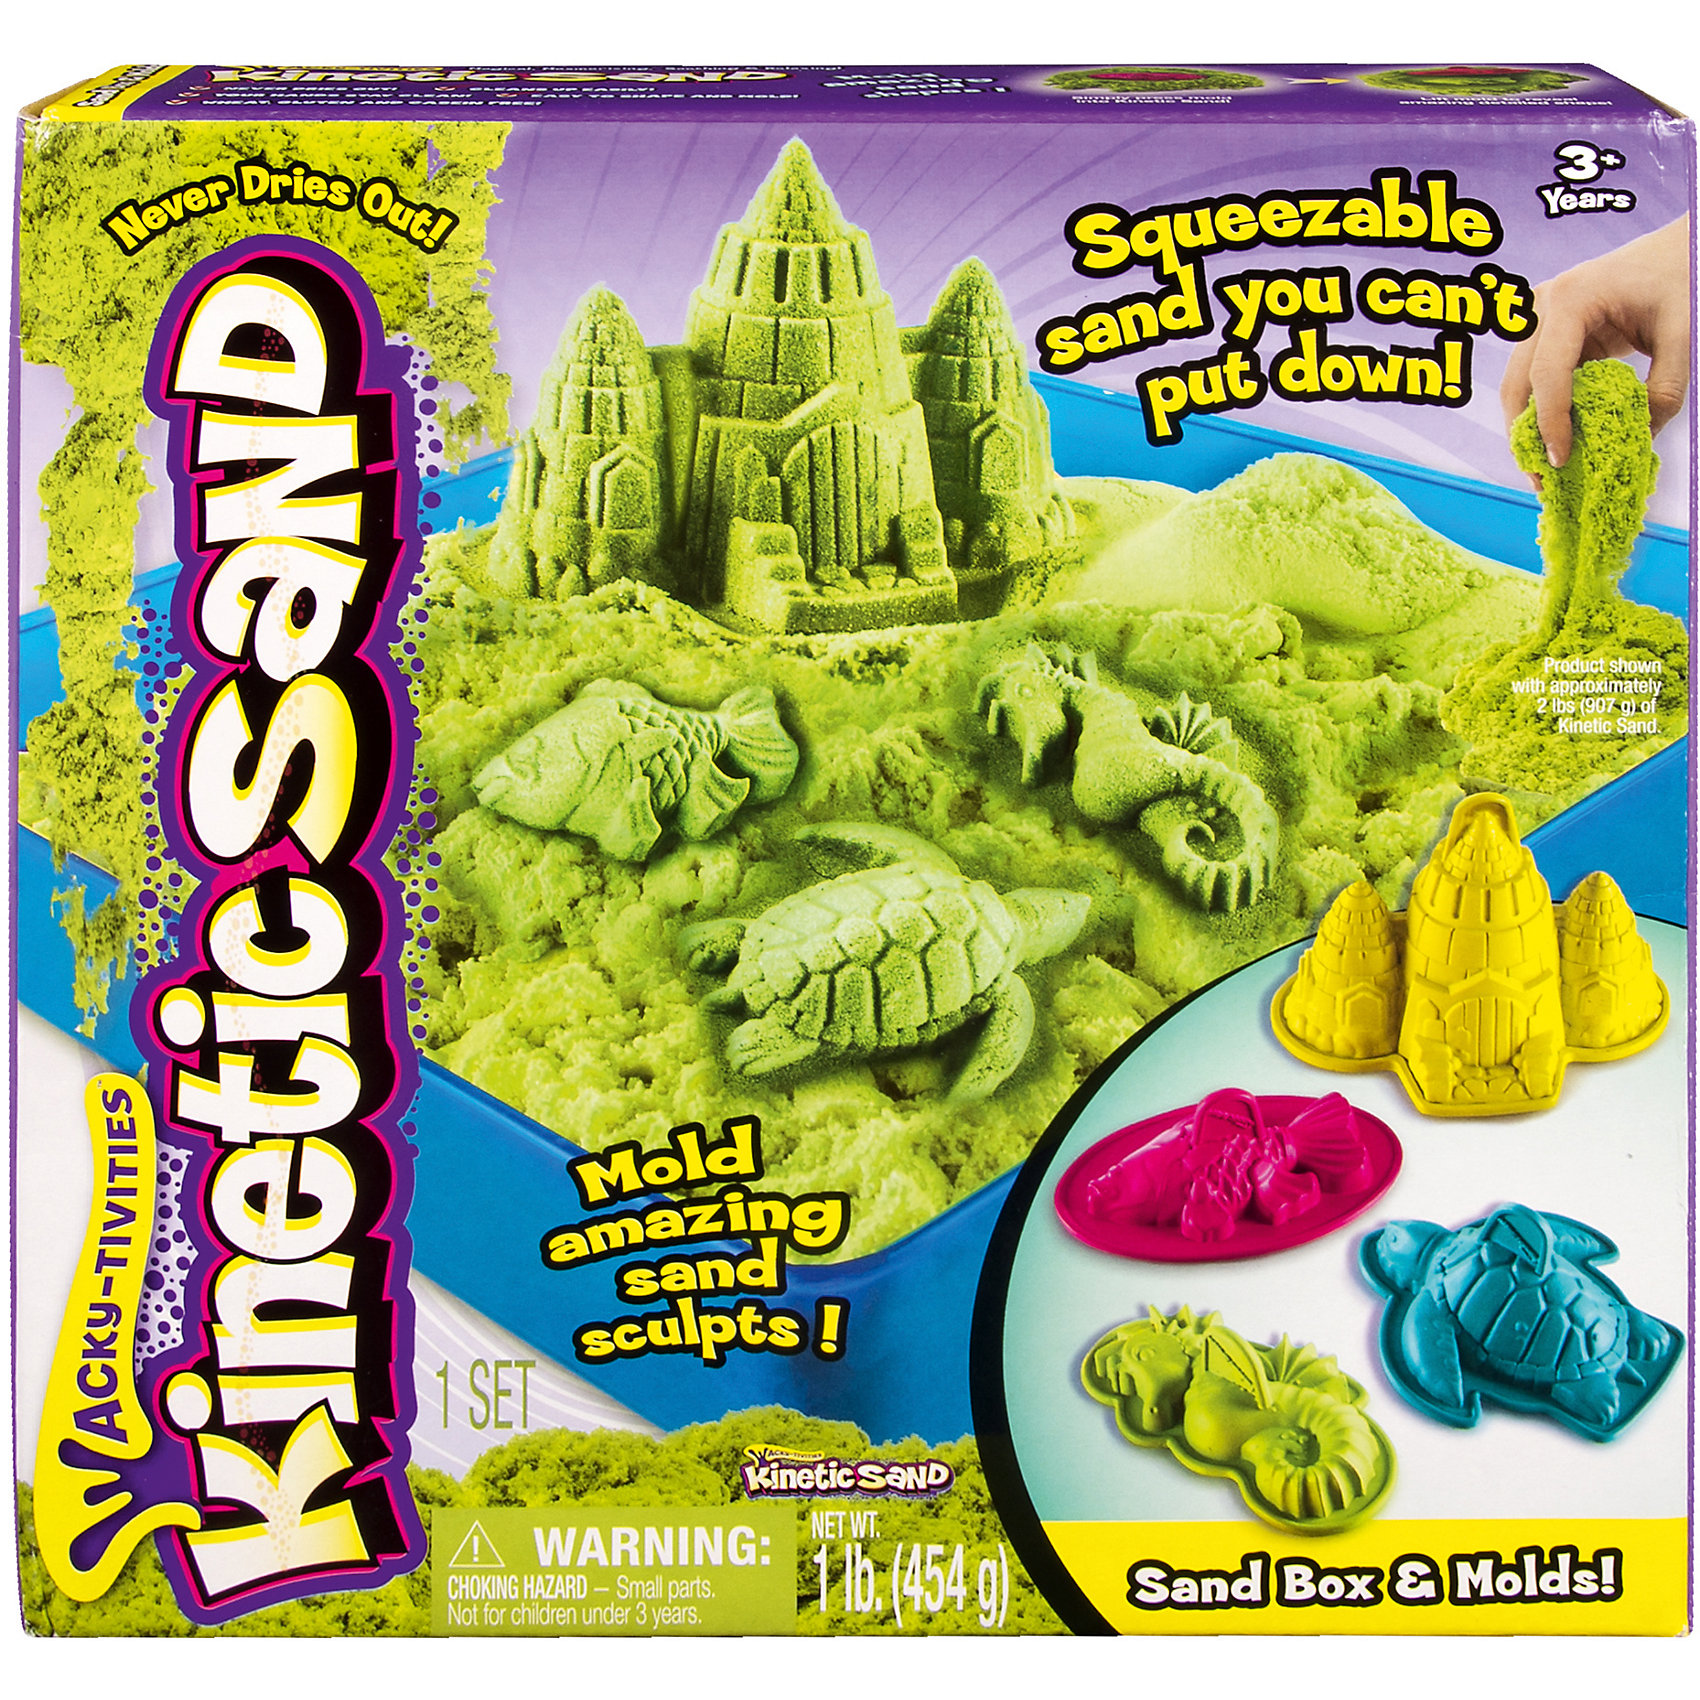 Kinetic sand Песок для лепки Kinetic sand, 454 гр, лоток, 4 формочки, зеленый kinetic sand waba fun 2 27 кг зеленый